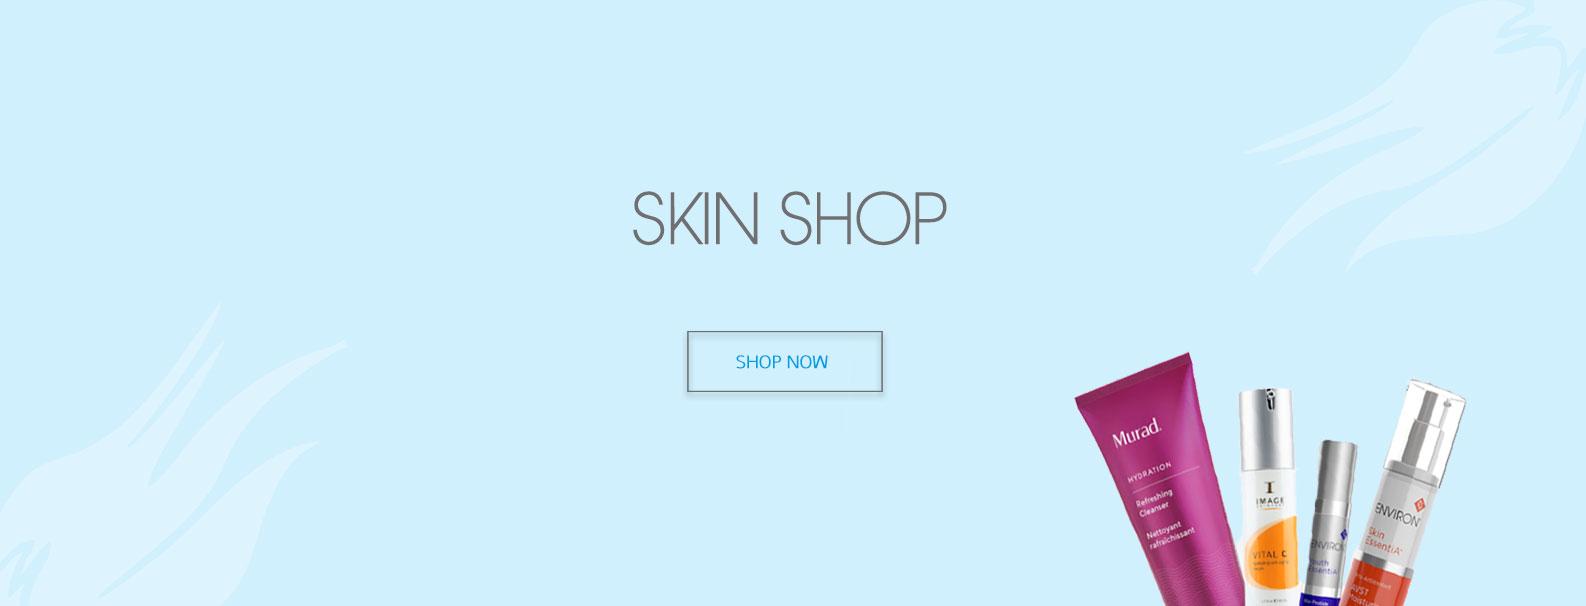 MediGlow Skin Shop